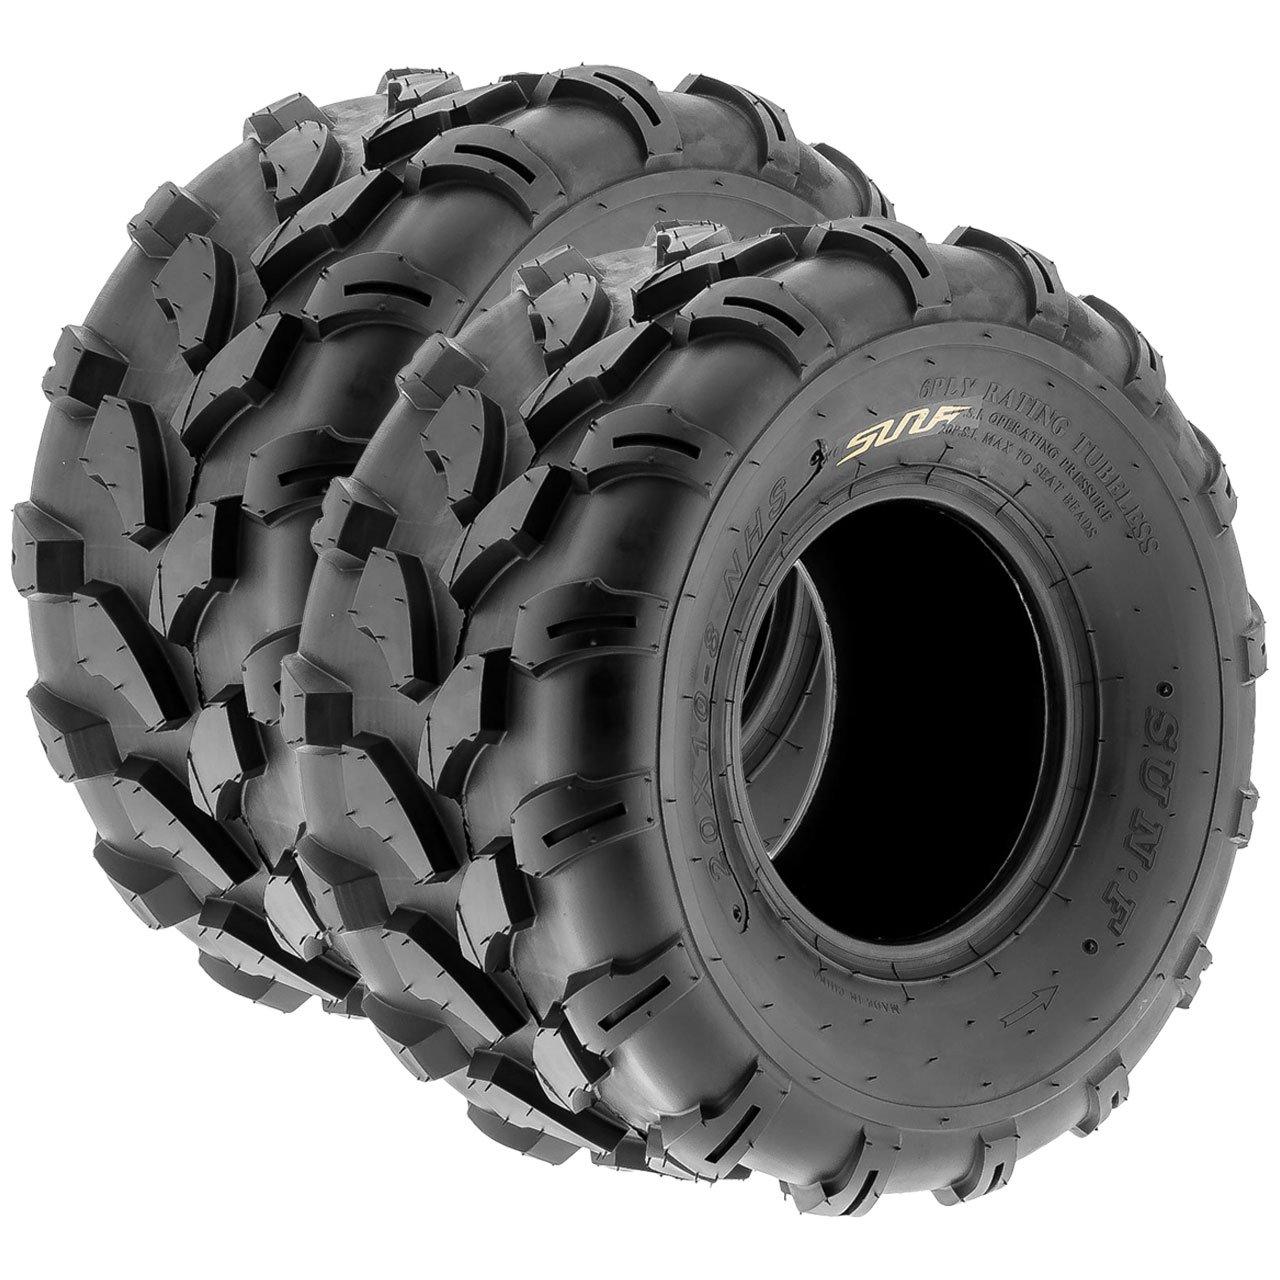 SunF A003 ATV/UTV/Lawn-Mowers Off-Road Tire 19x9.5-8, 6 PR, Directional Tread (Pair of 2)